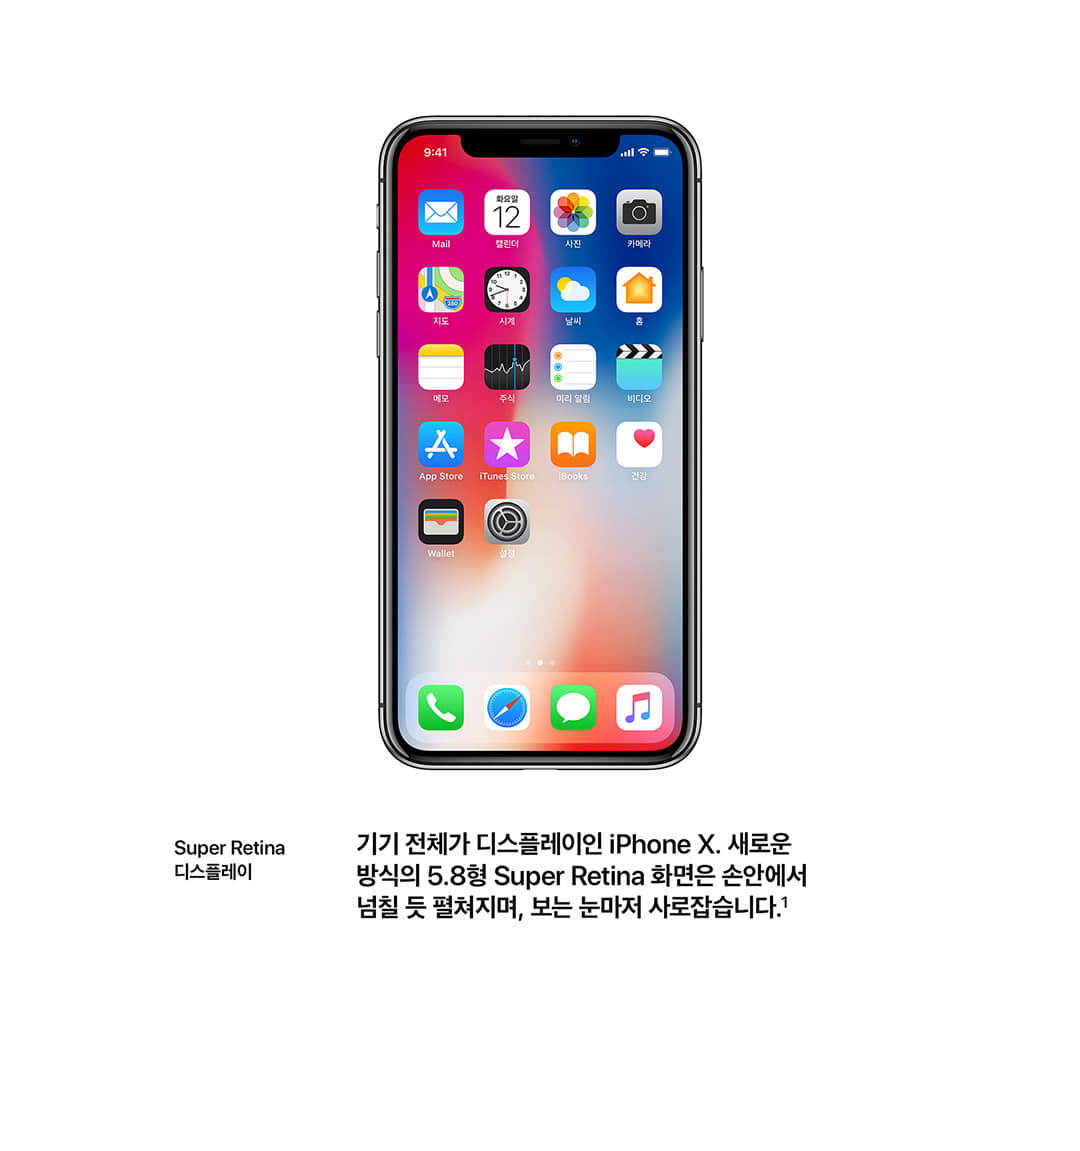 super retina 디스플레이 기기전체가 디스플레이인 iPhoneX. 새로운 방식의 5.8형 super retina 화면은 손안에서 넘칠듯 펼쳐지며, 보는 눈마저 사로잡습니다.1